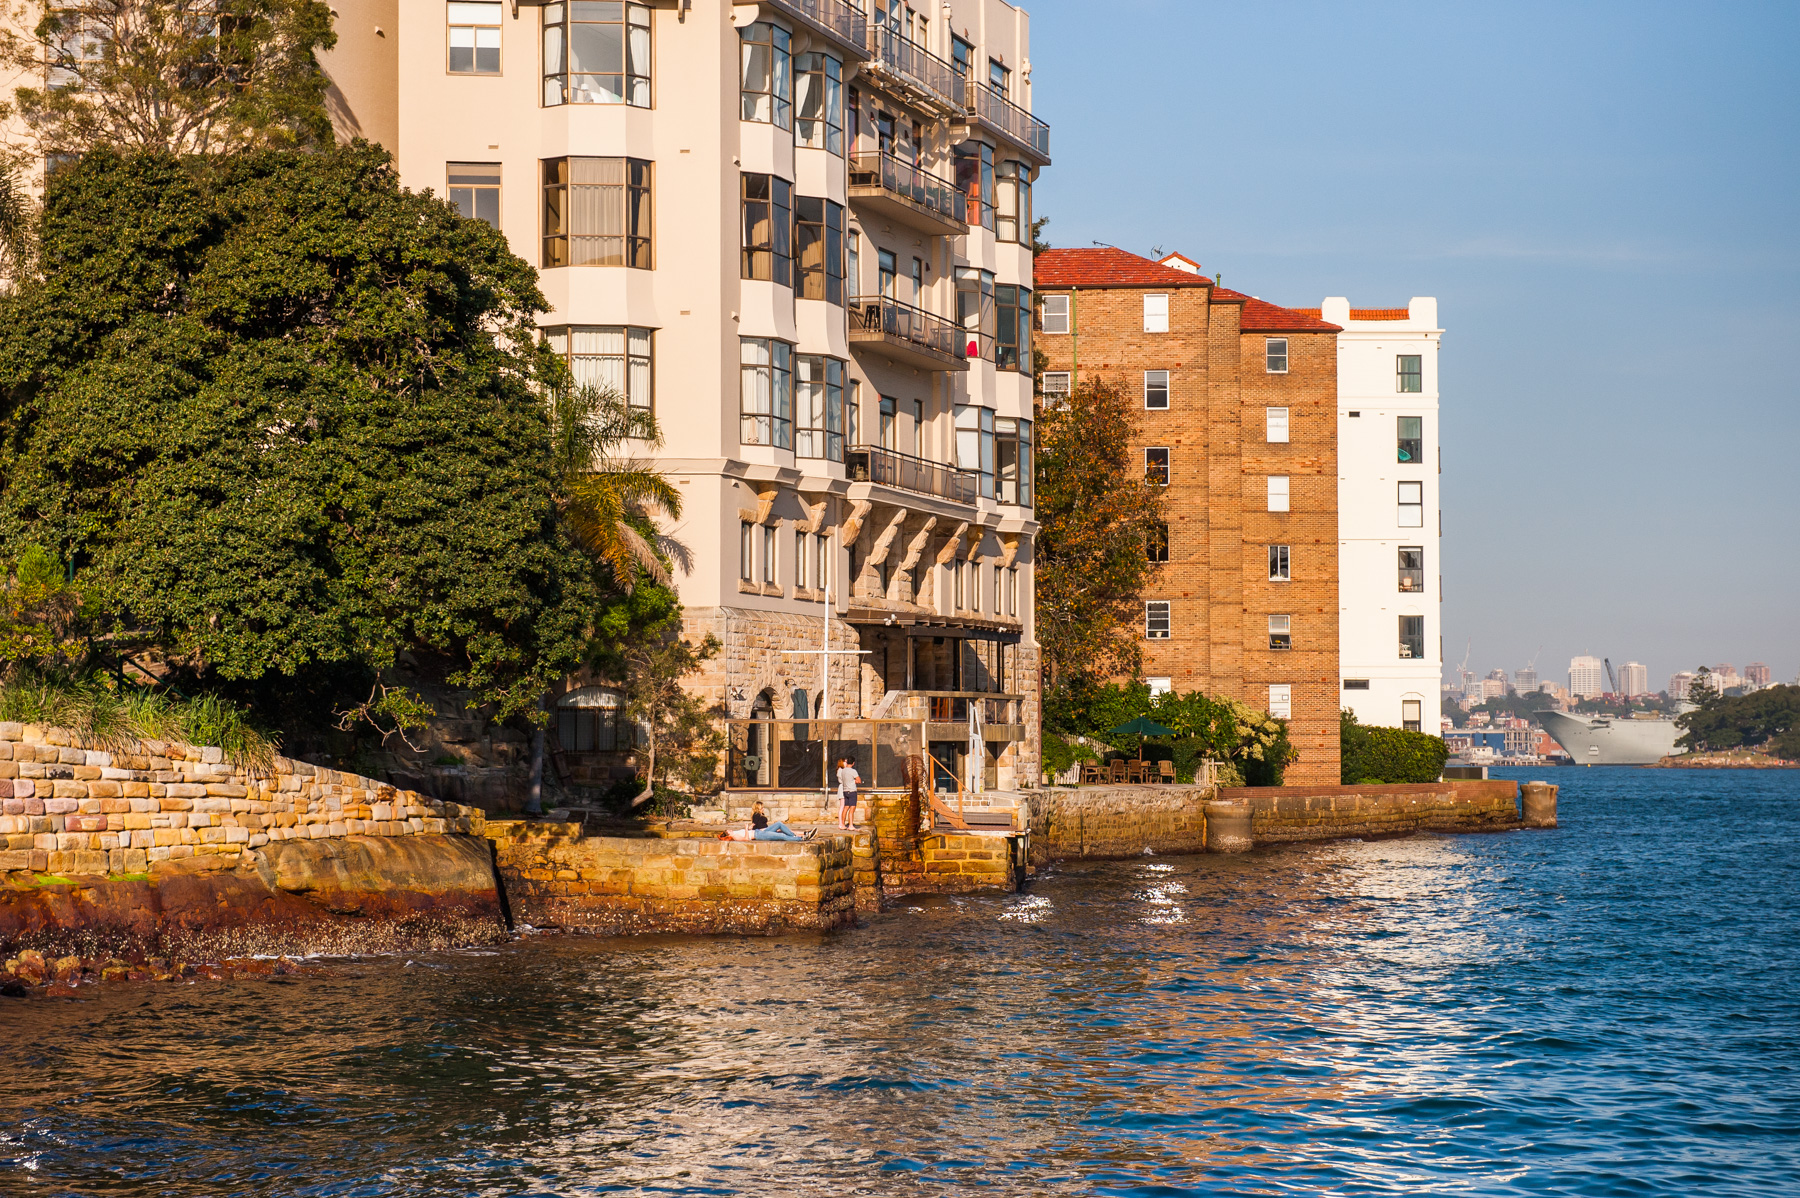 Jeffrey Street Wharf | Kirribilli | View from wharf